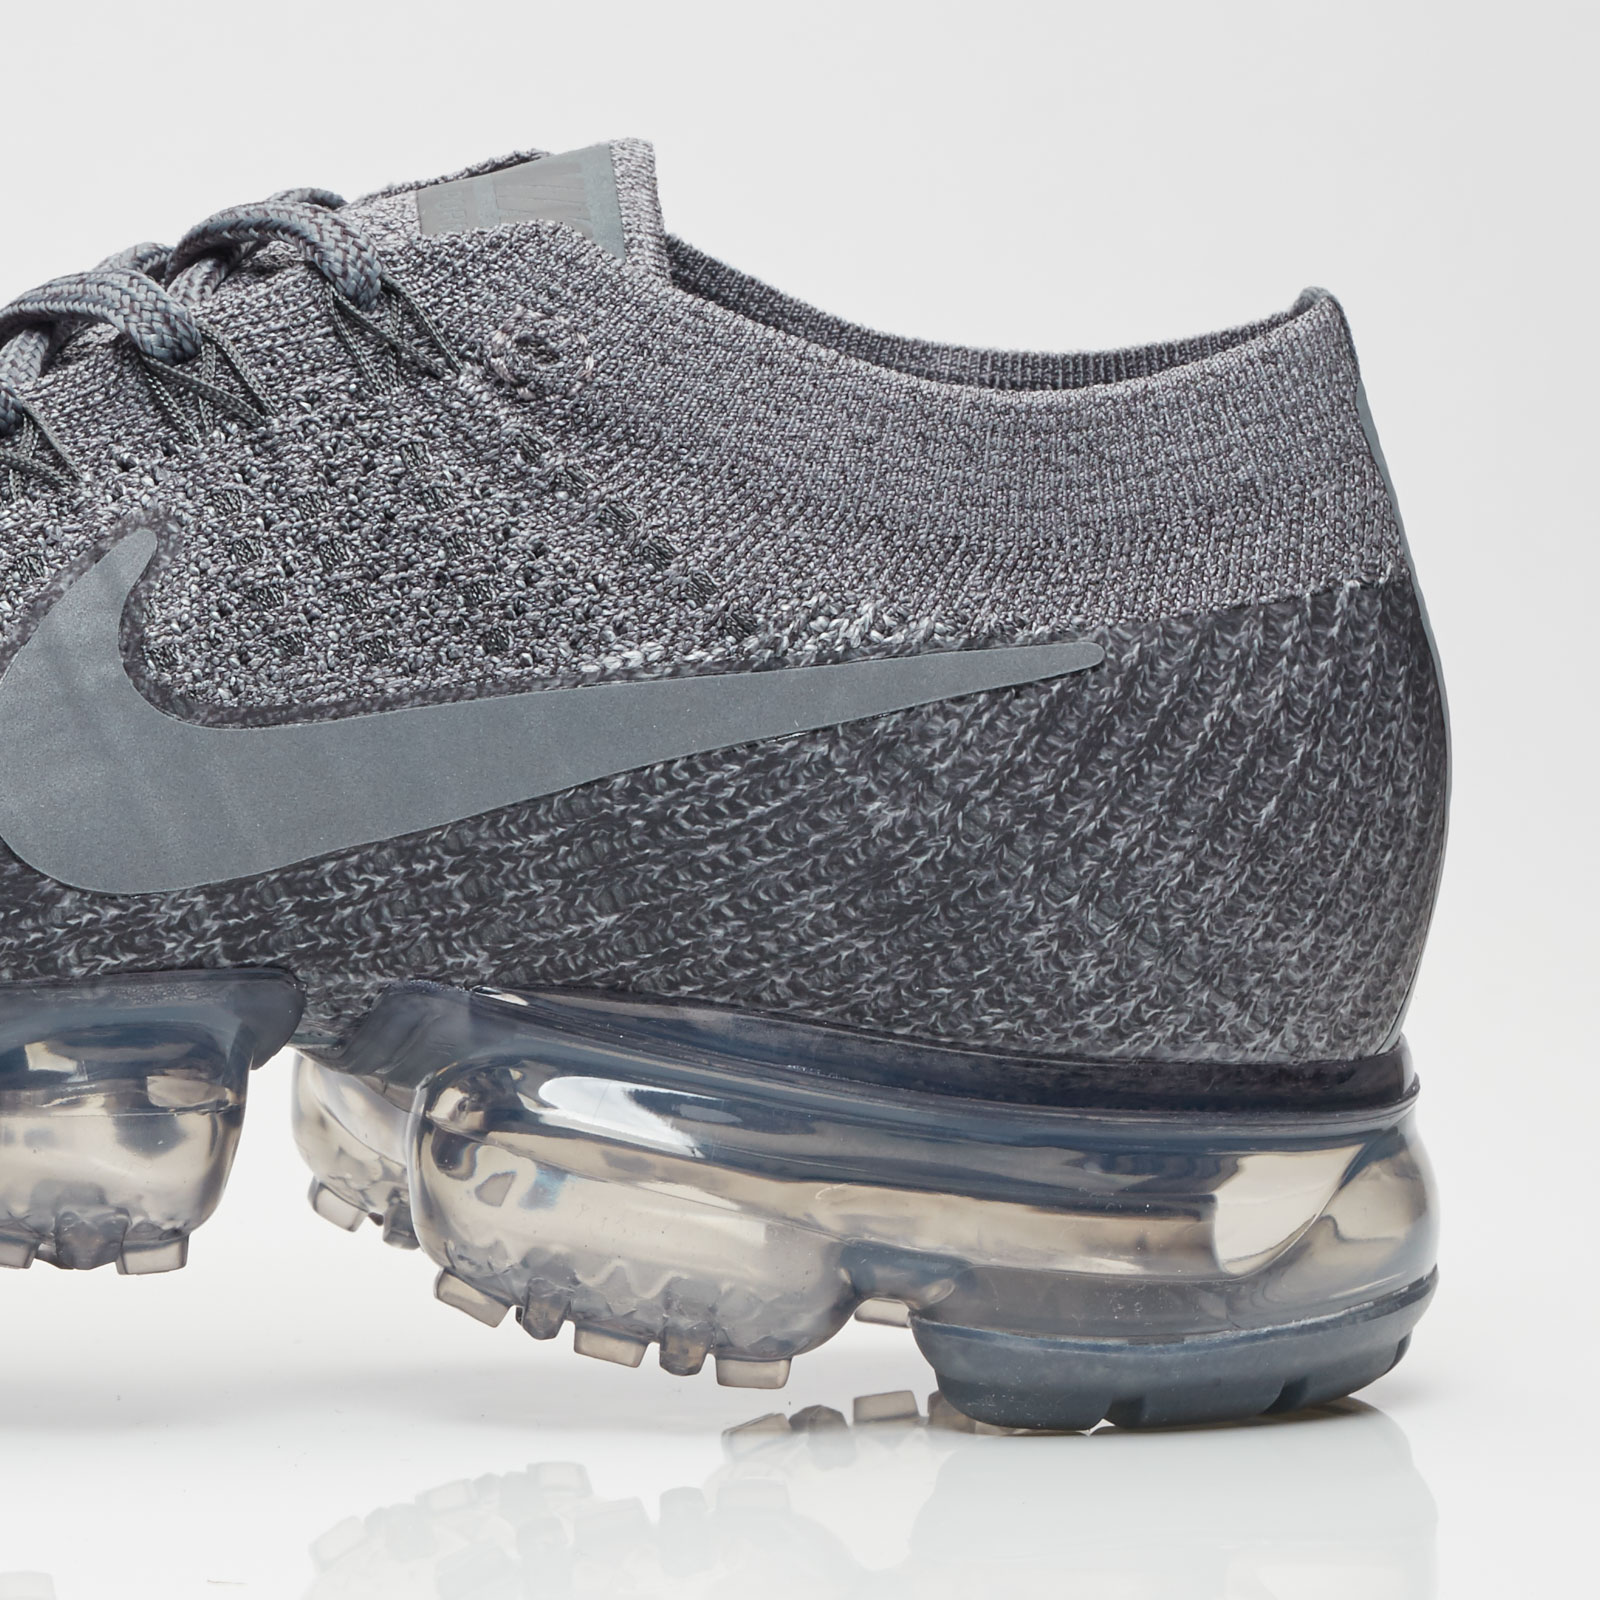 7337e4ba55563 Nike NikeLab Air Vapormax Flyknit - 899473-005 - Sneakersnstuff ...